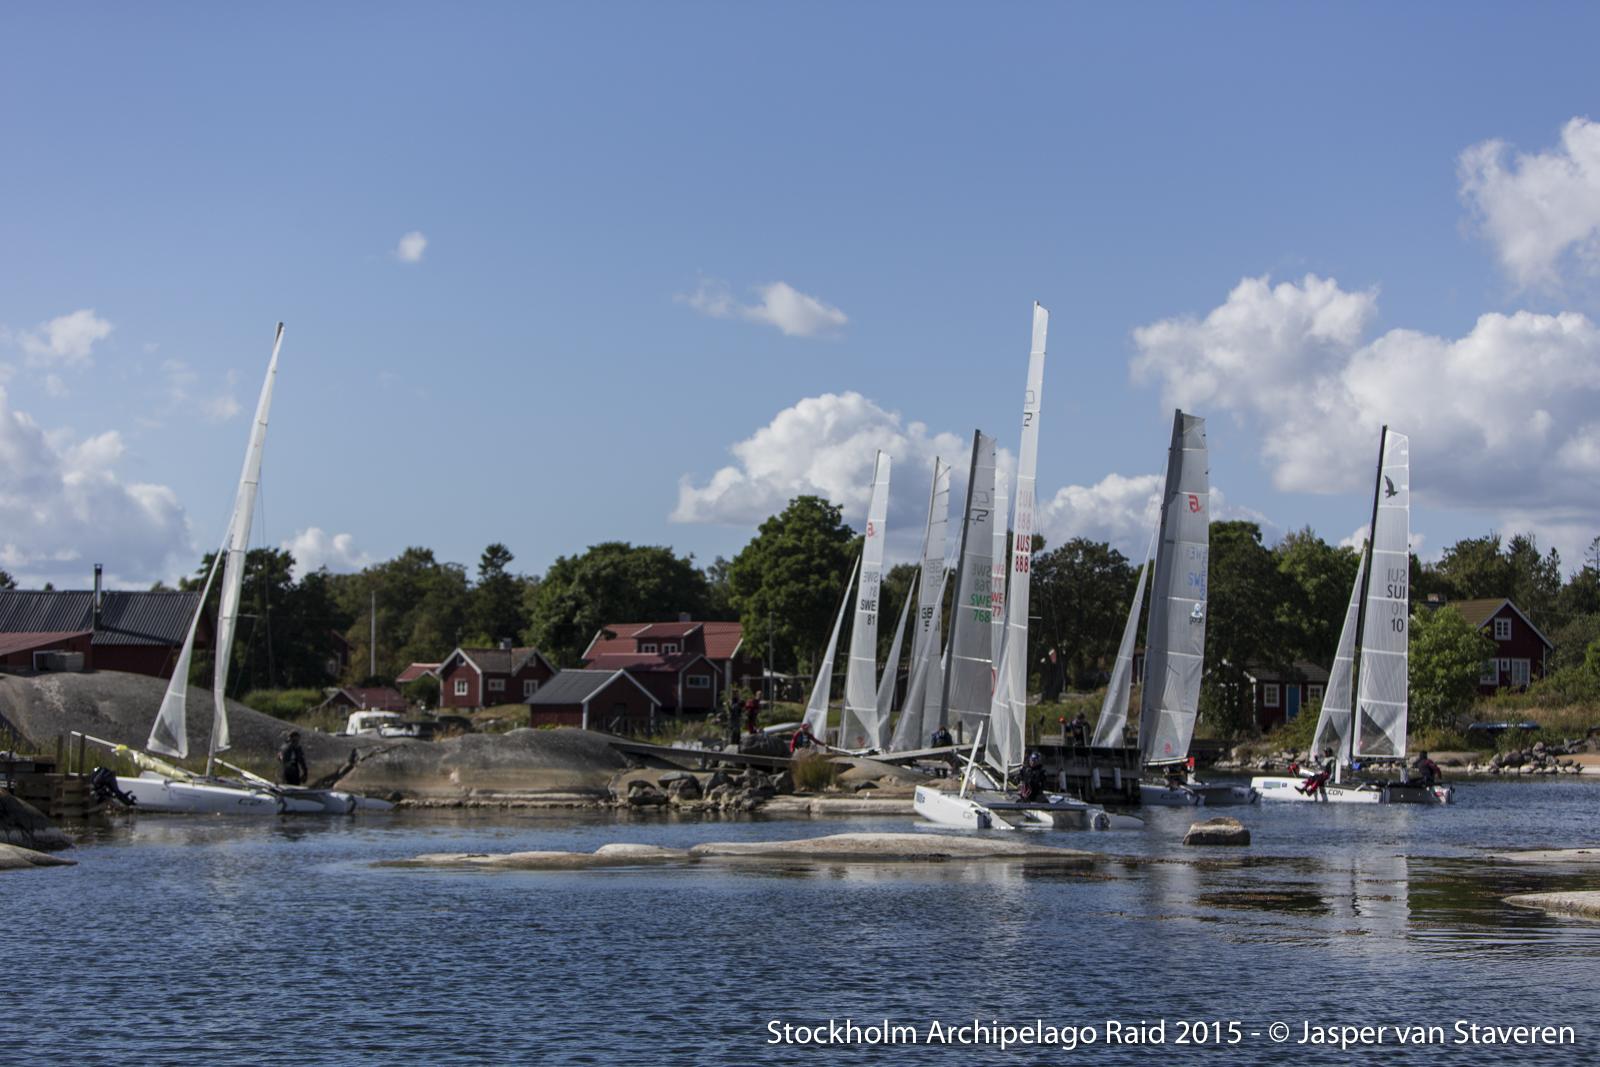 Stockholm Archipelago Raid 2015-6139-2